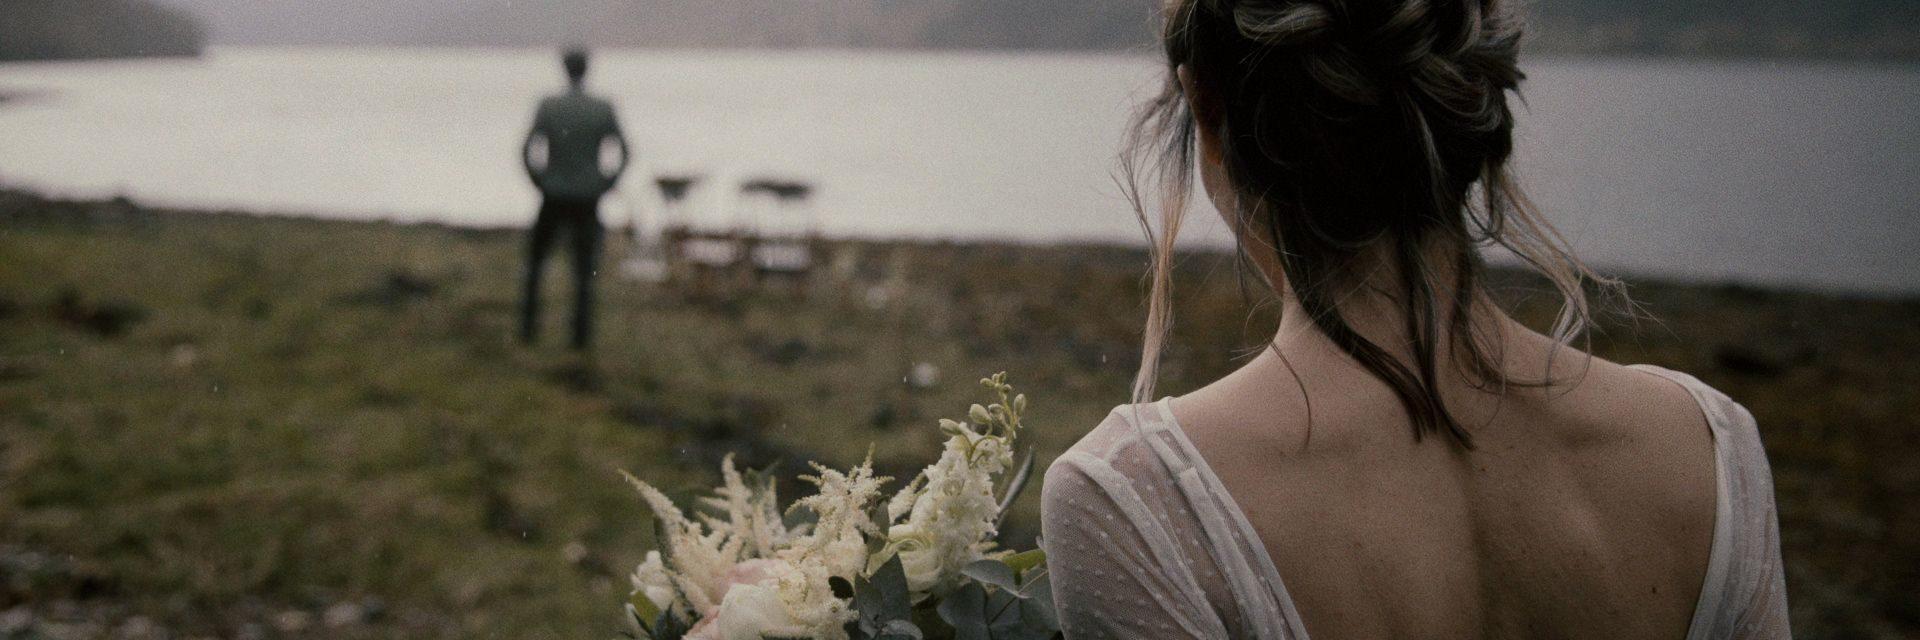 Lausanne-wedding-videographer-cinemate-films-02